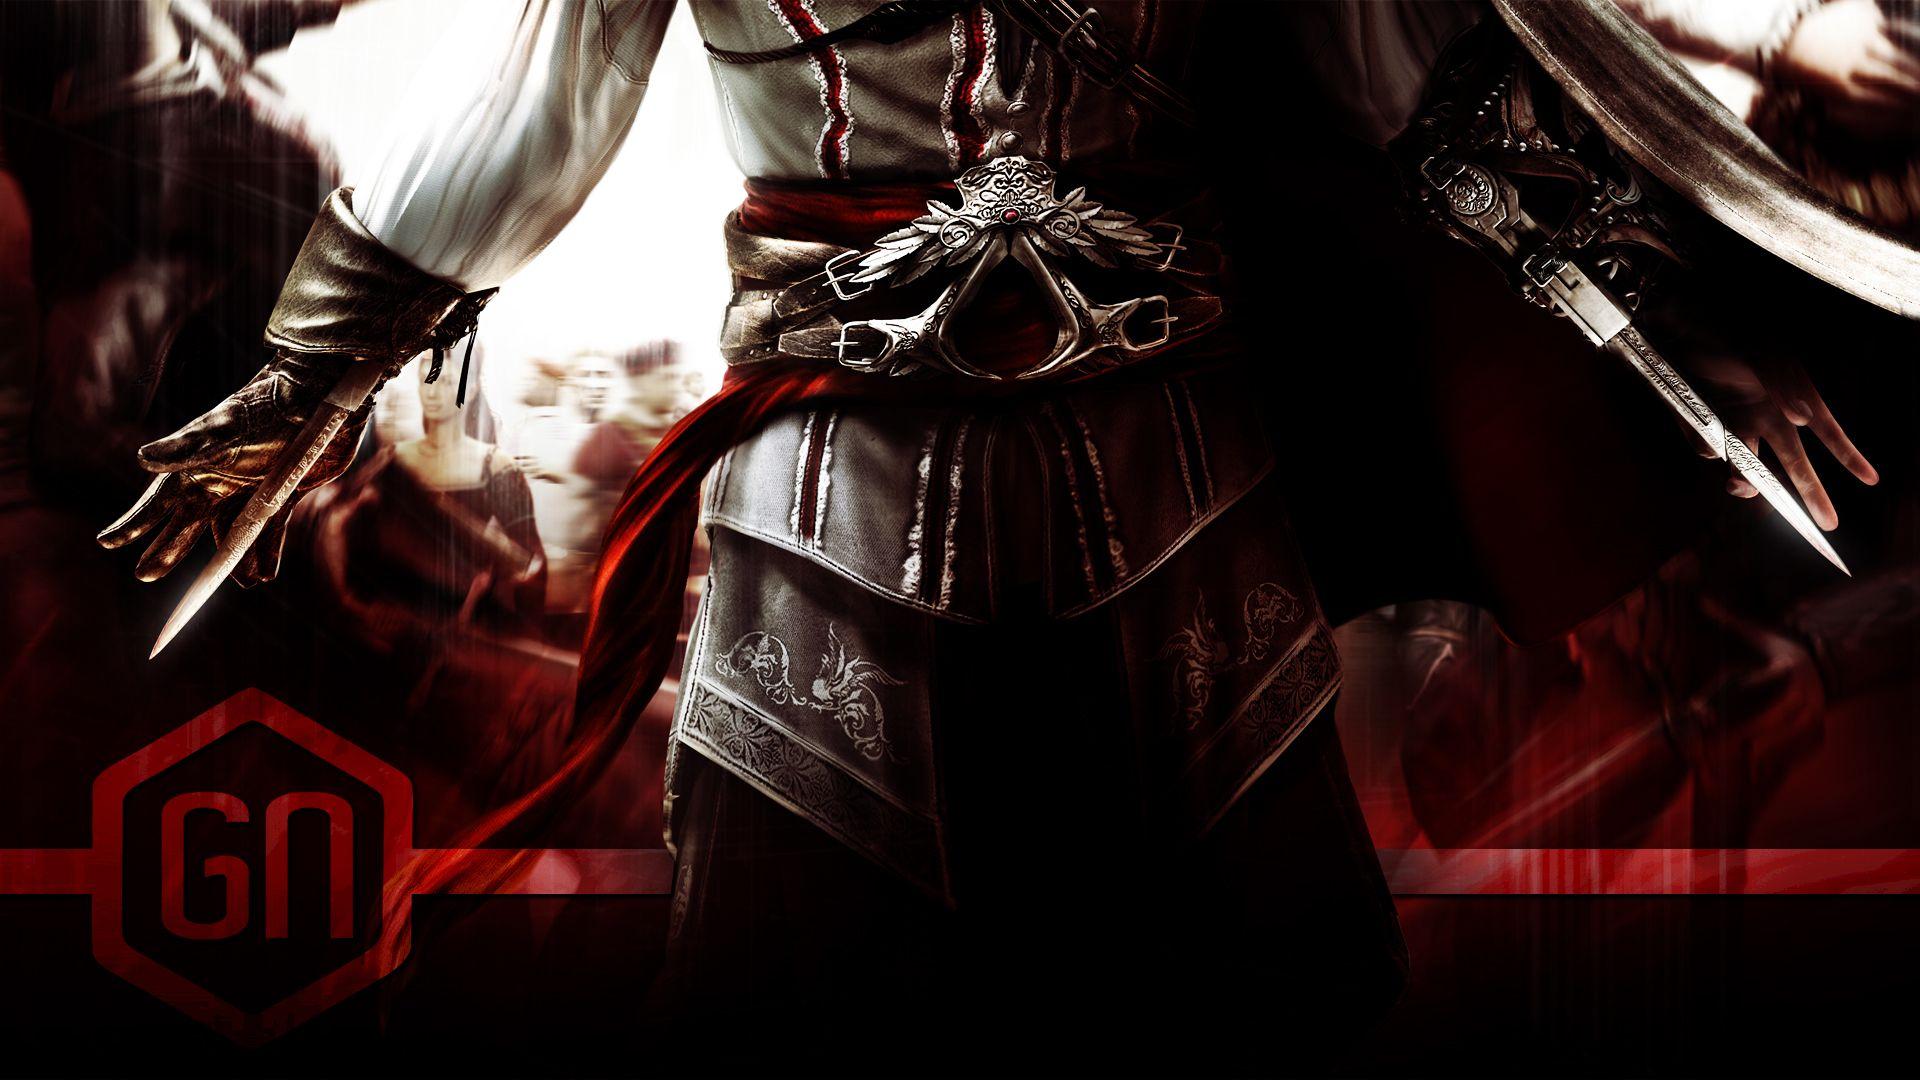 Assassin S Creed 2 Ezio Auditore Wallpaper Assassins Creed Assassin S Creed Assassins Creed 2